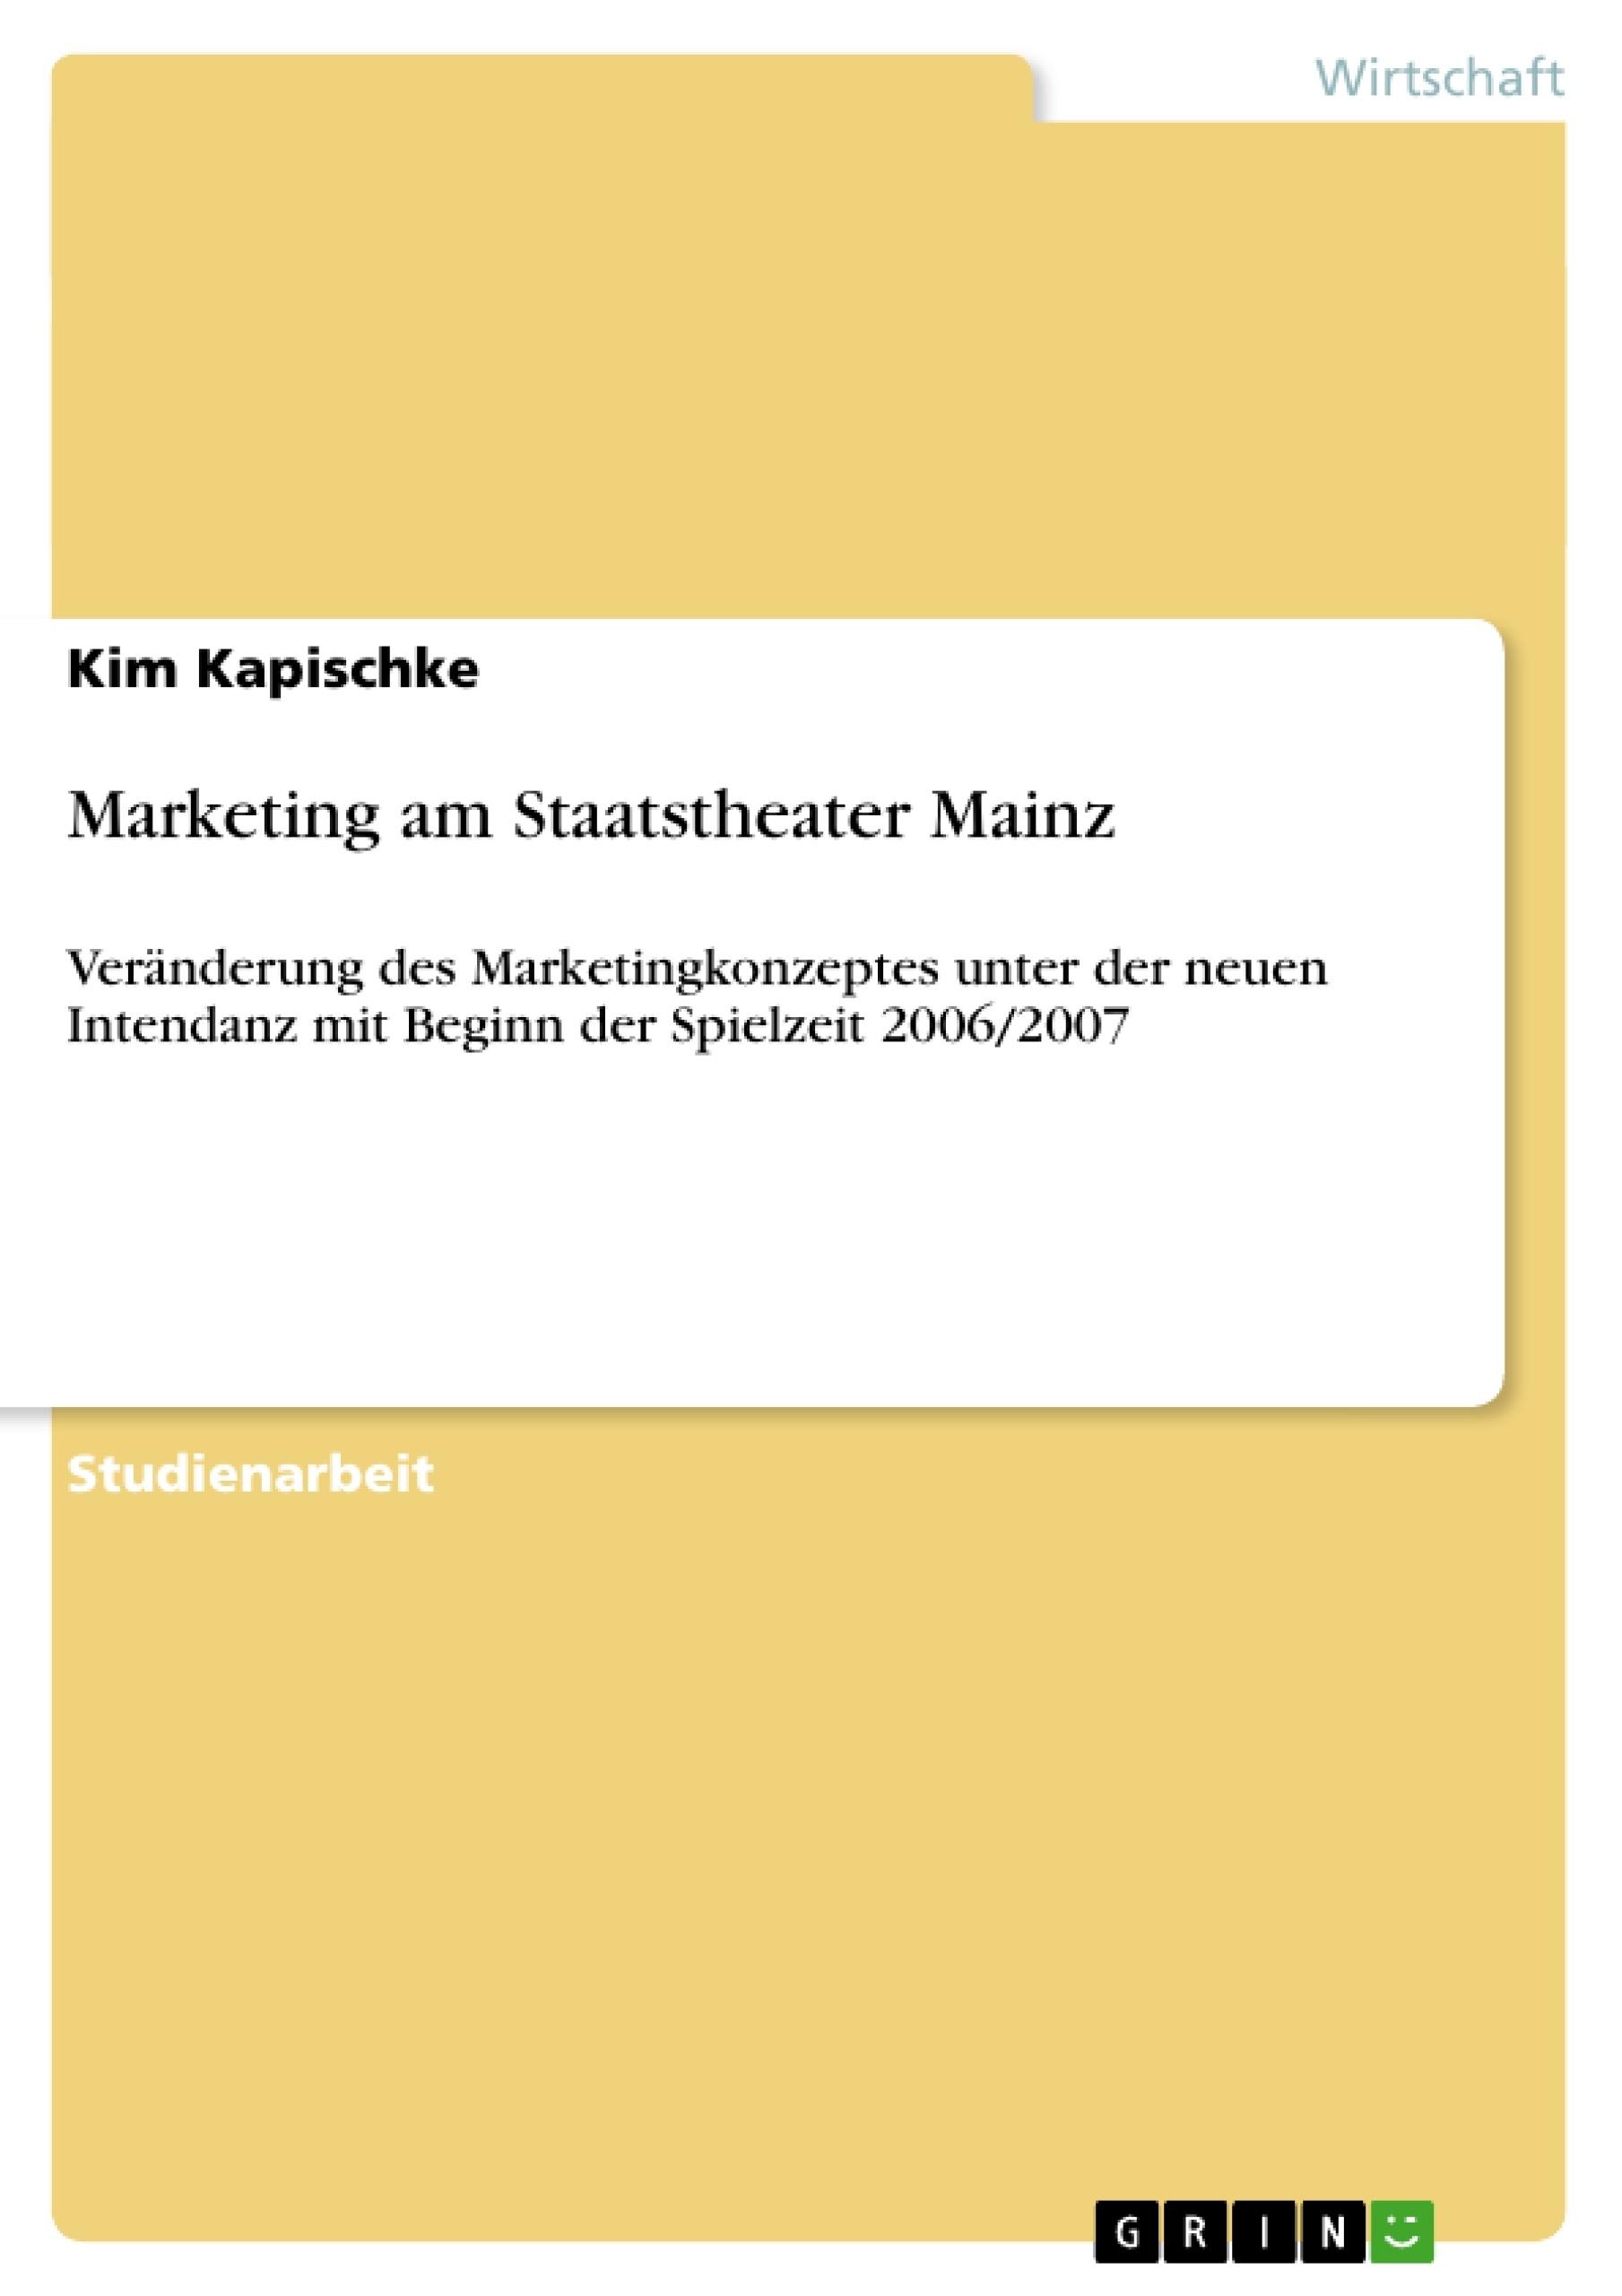 Titel: Marketing am Staatstheater Mainz